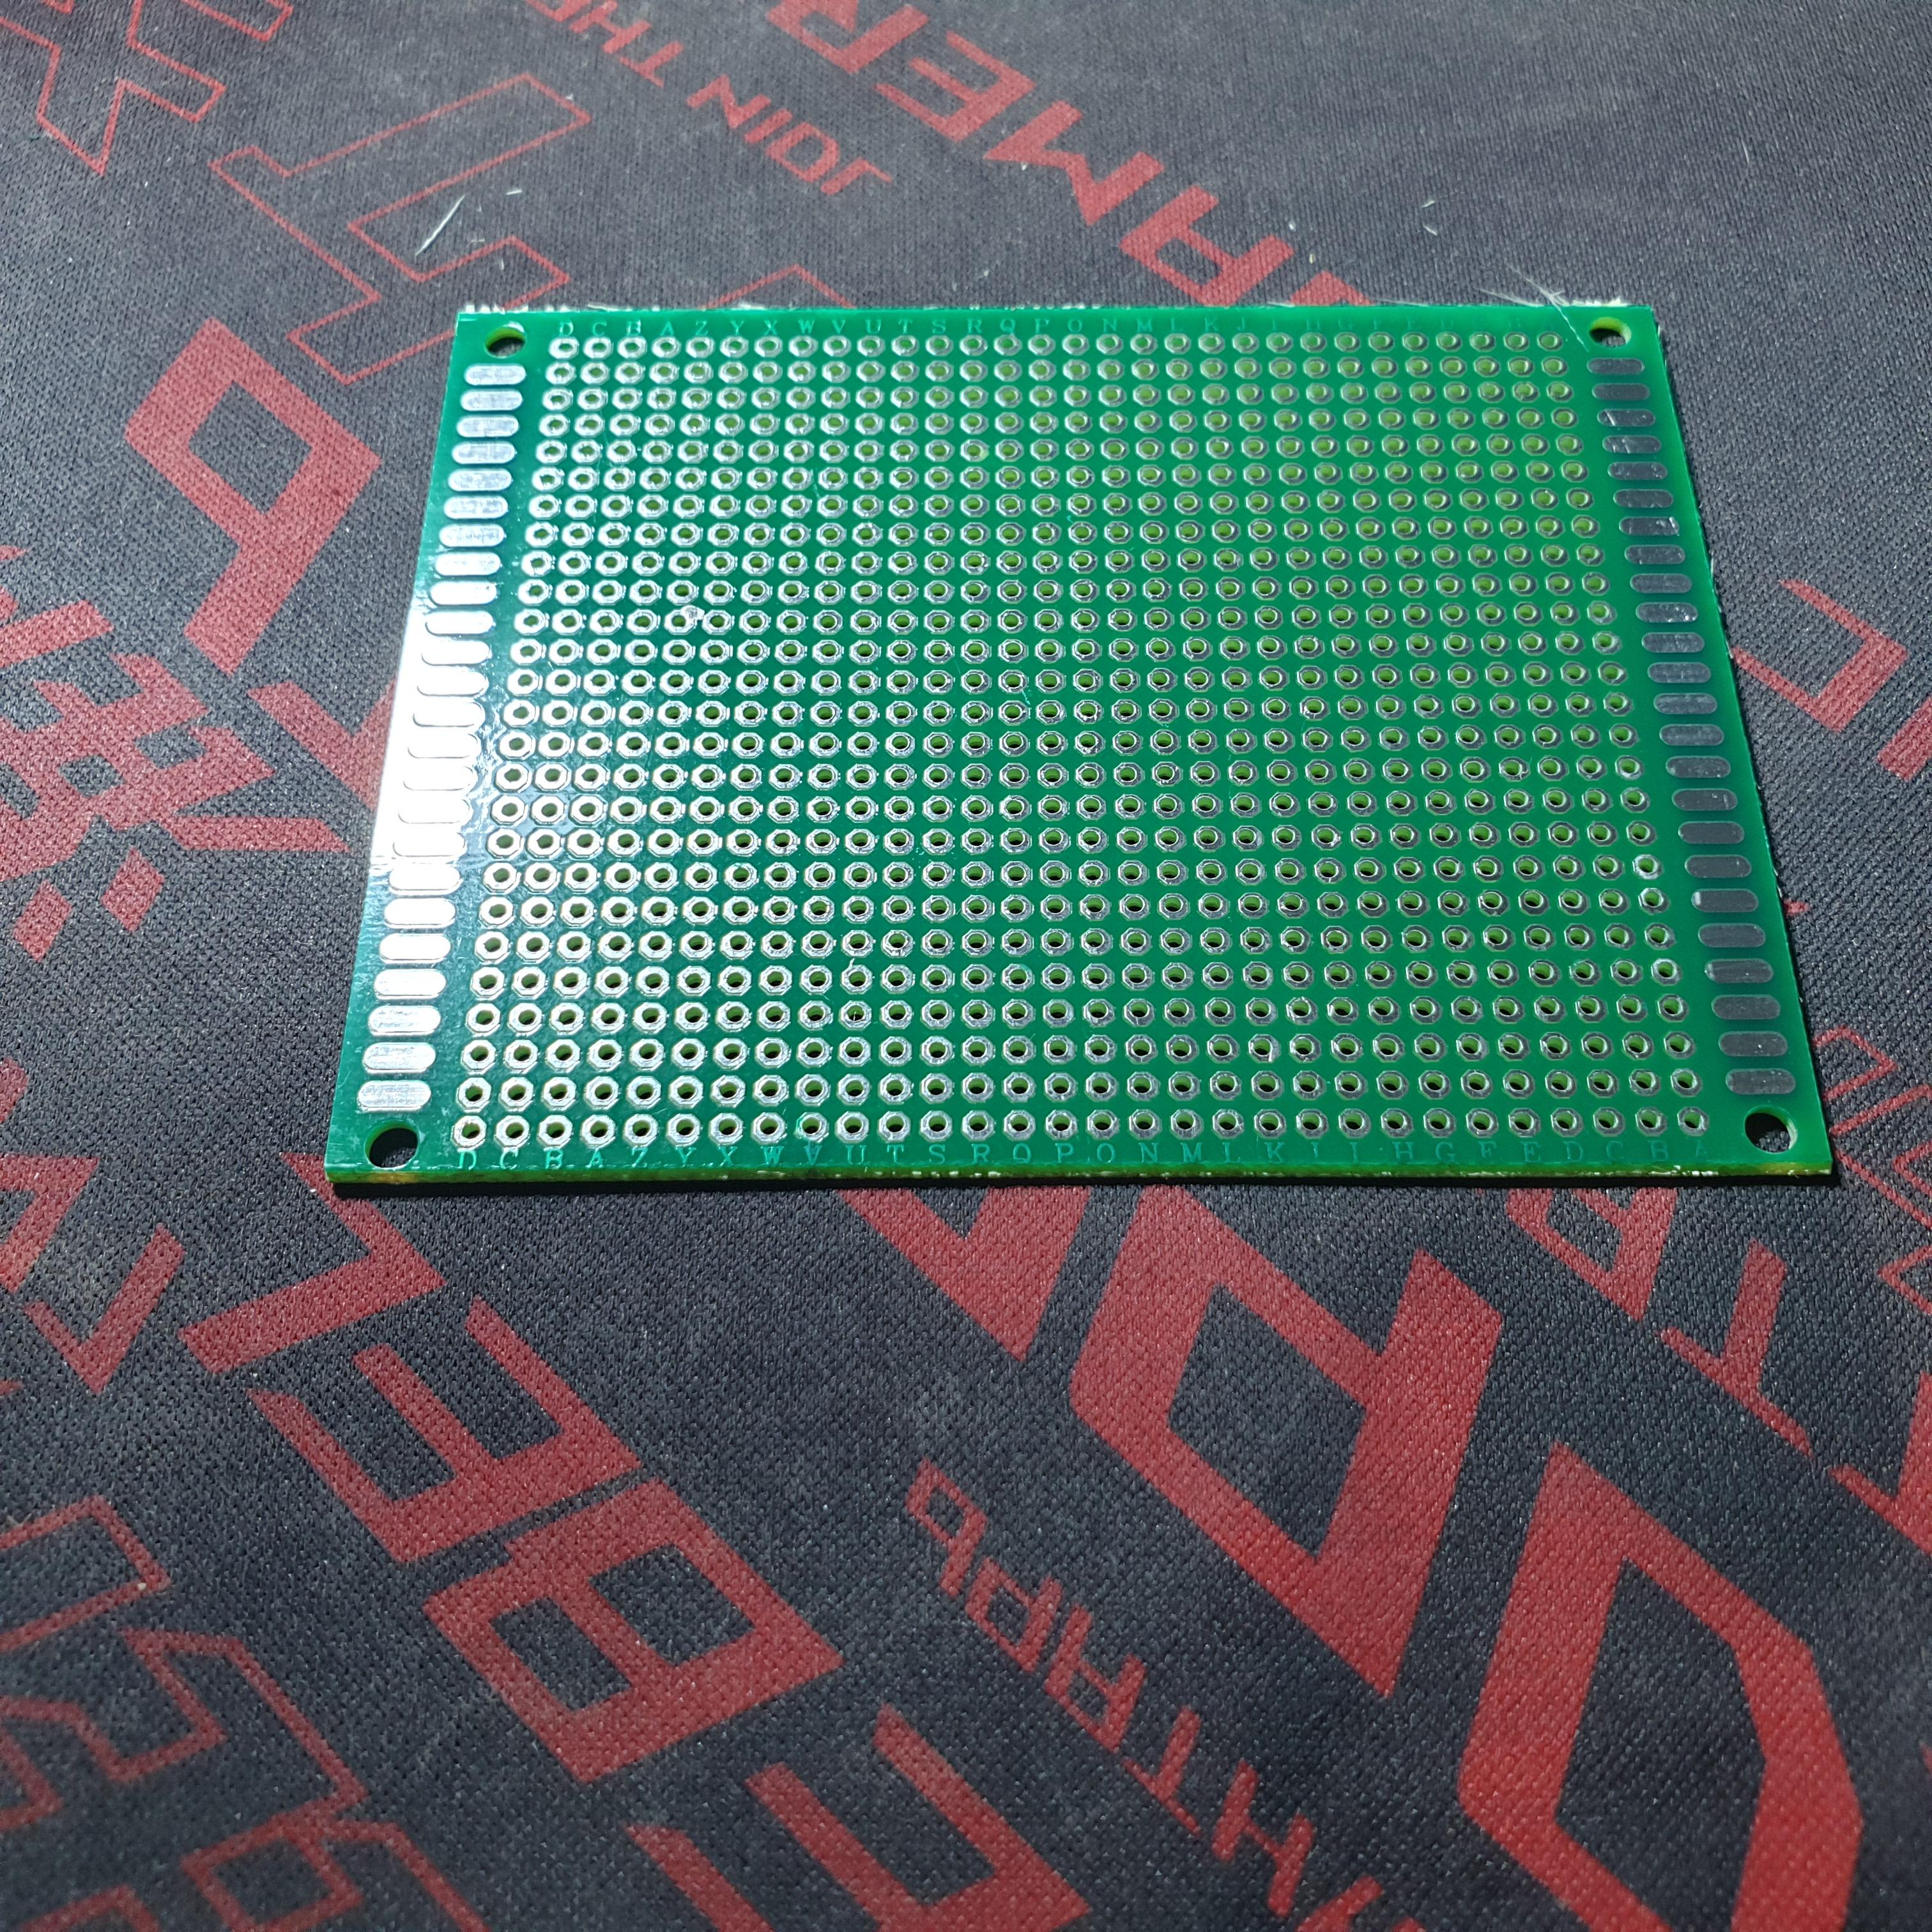 5X Double-Sided PCB Circuit Module Board Prototype Breadboard 4X6cm For ARDUINO